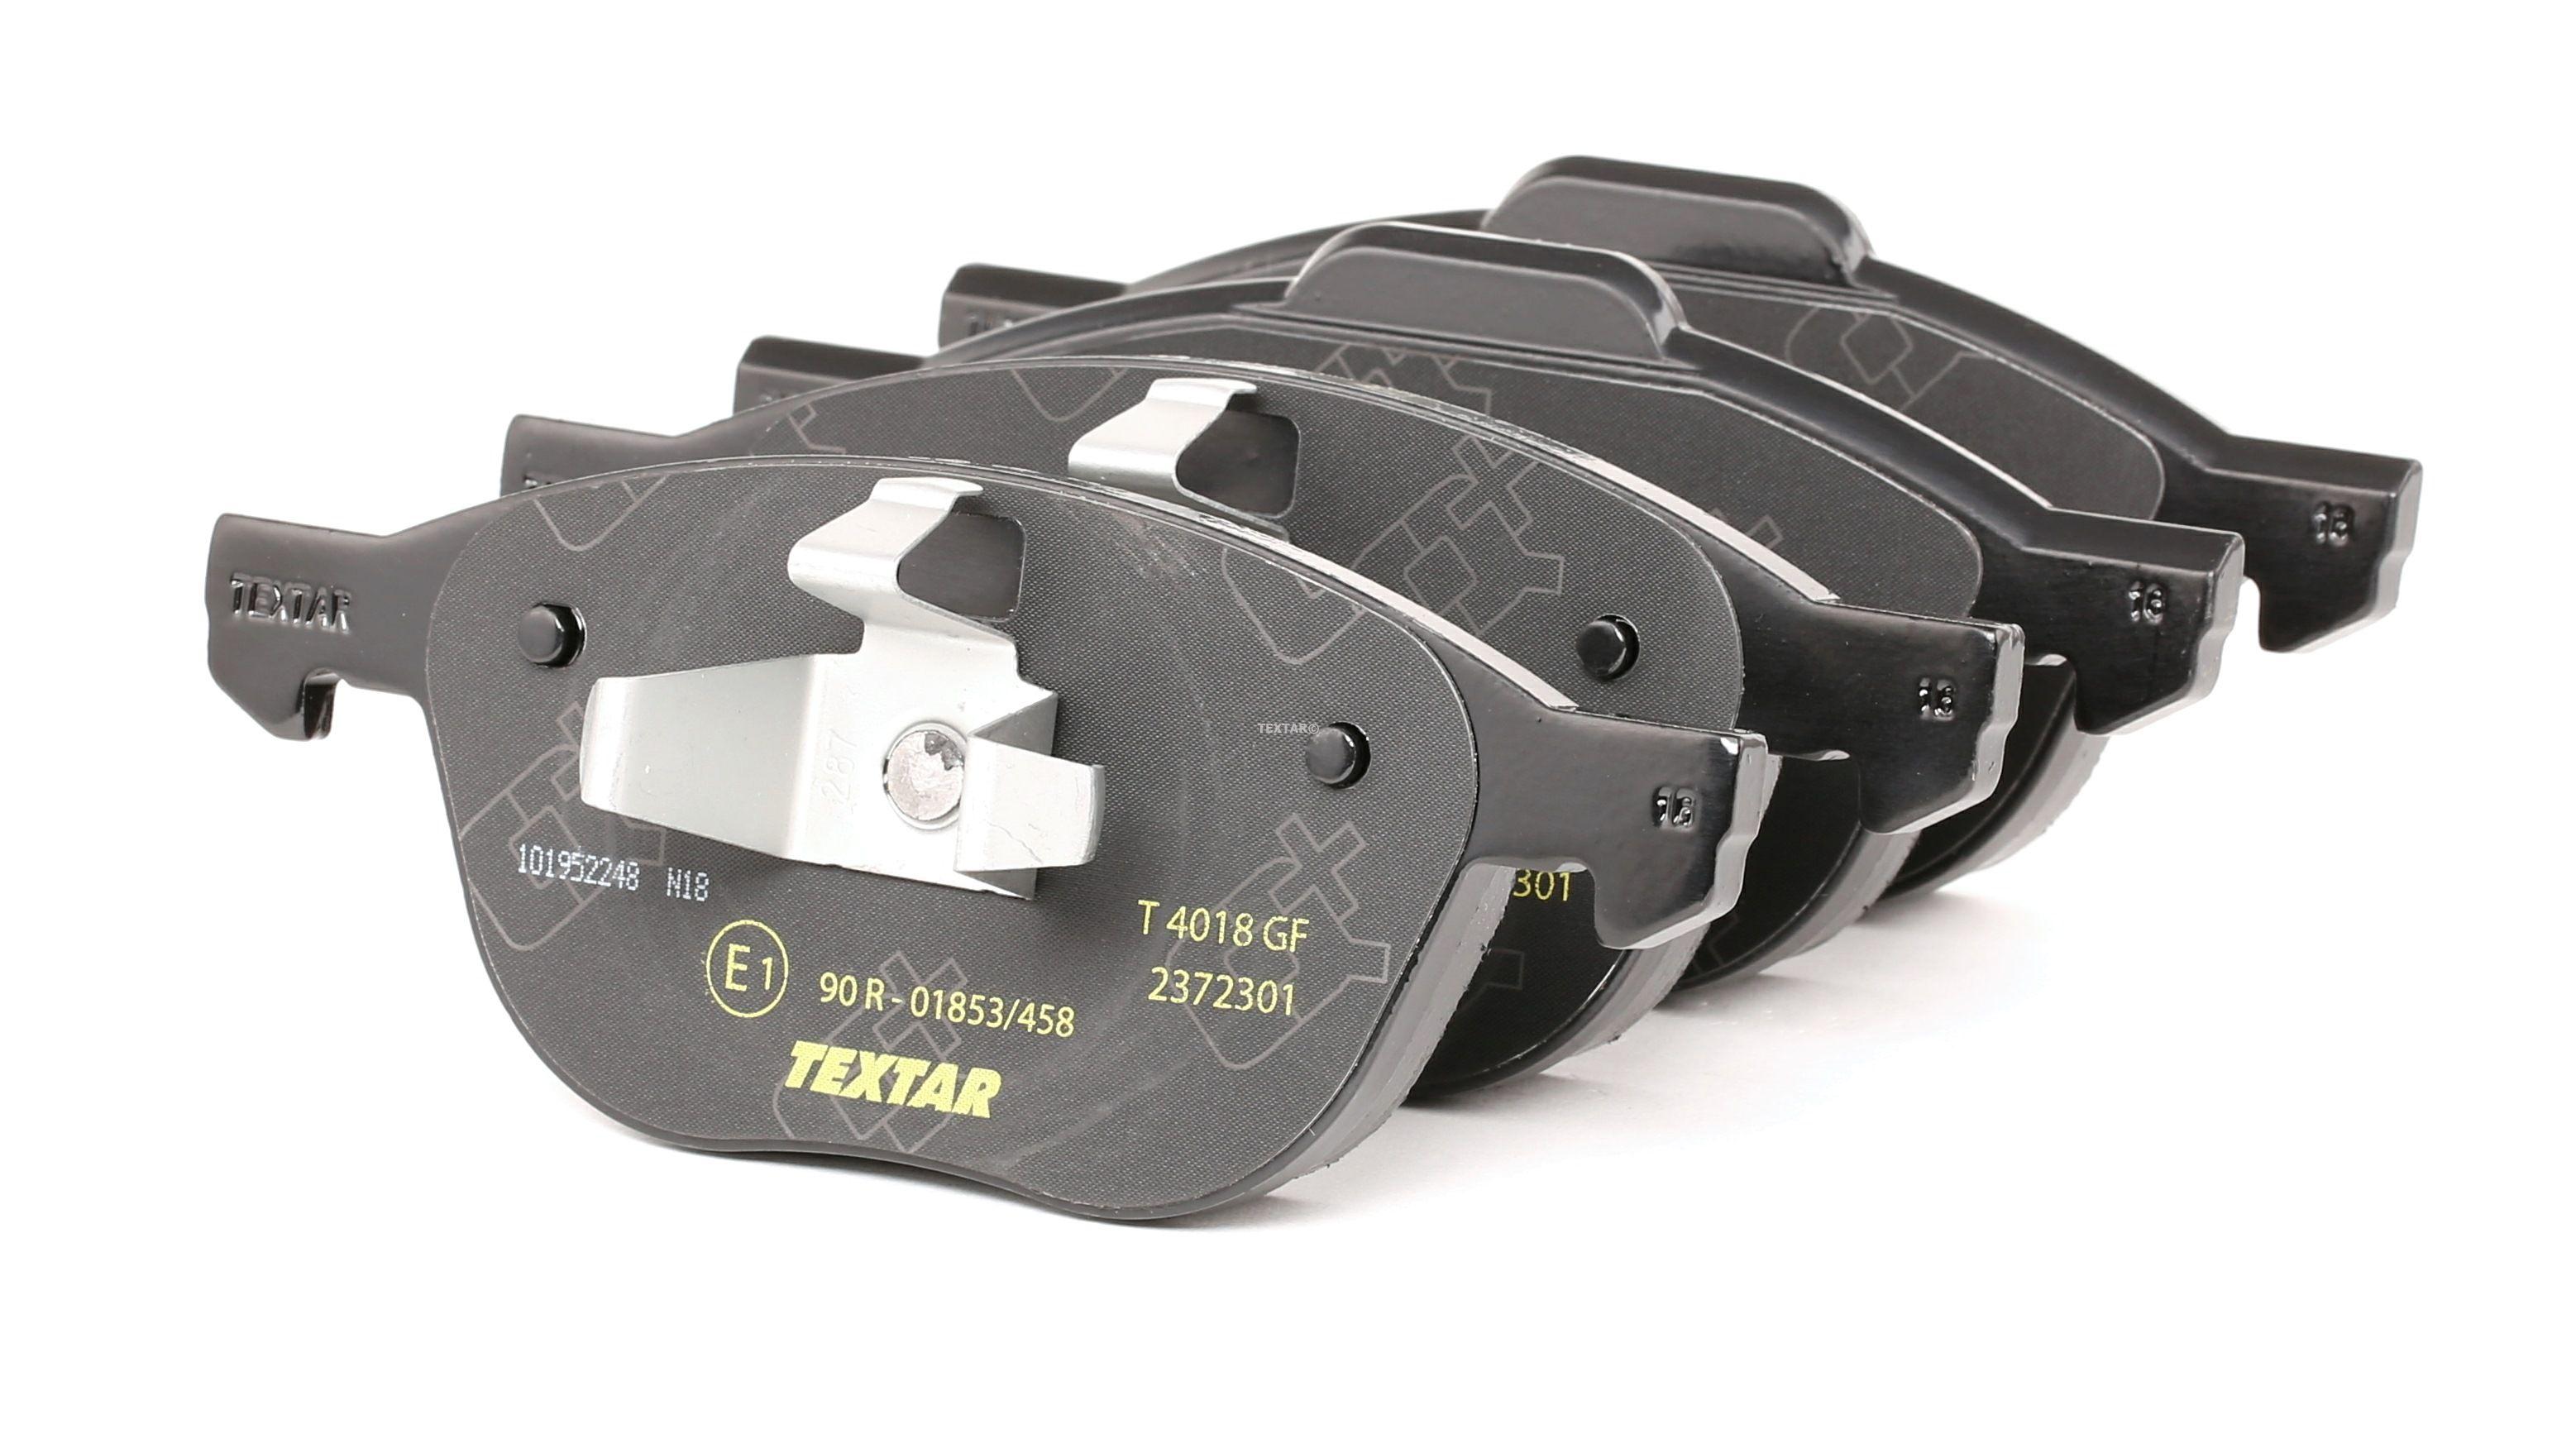 Bremsbelagsatz TEXTAR 23724 Bewertung